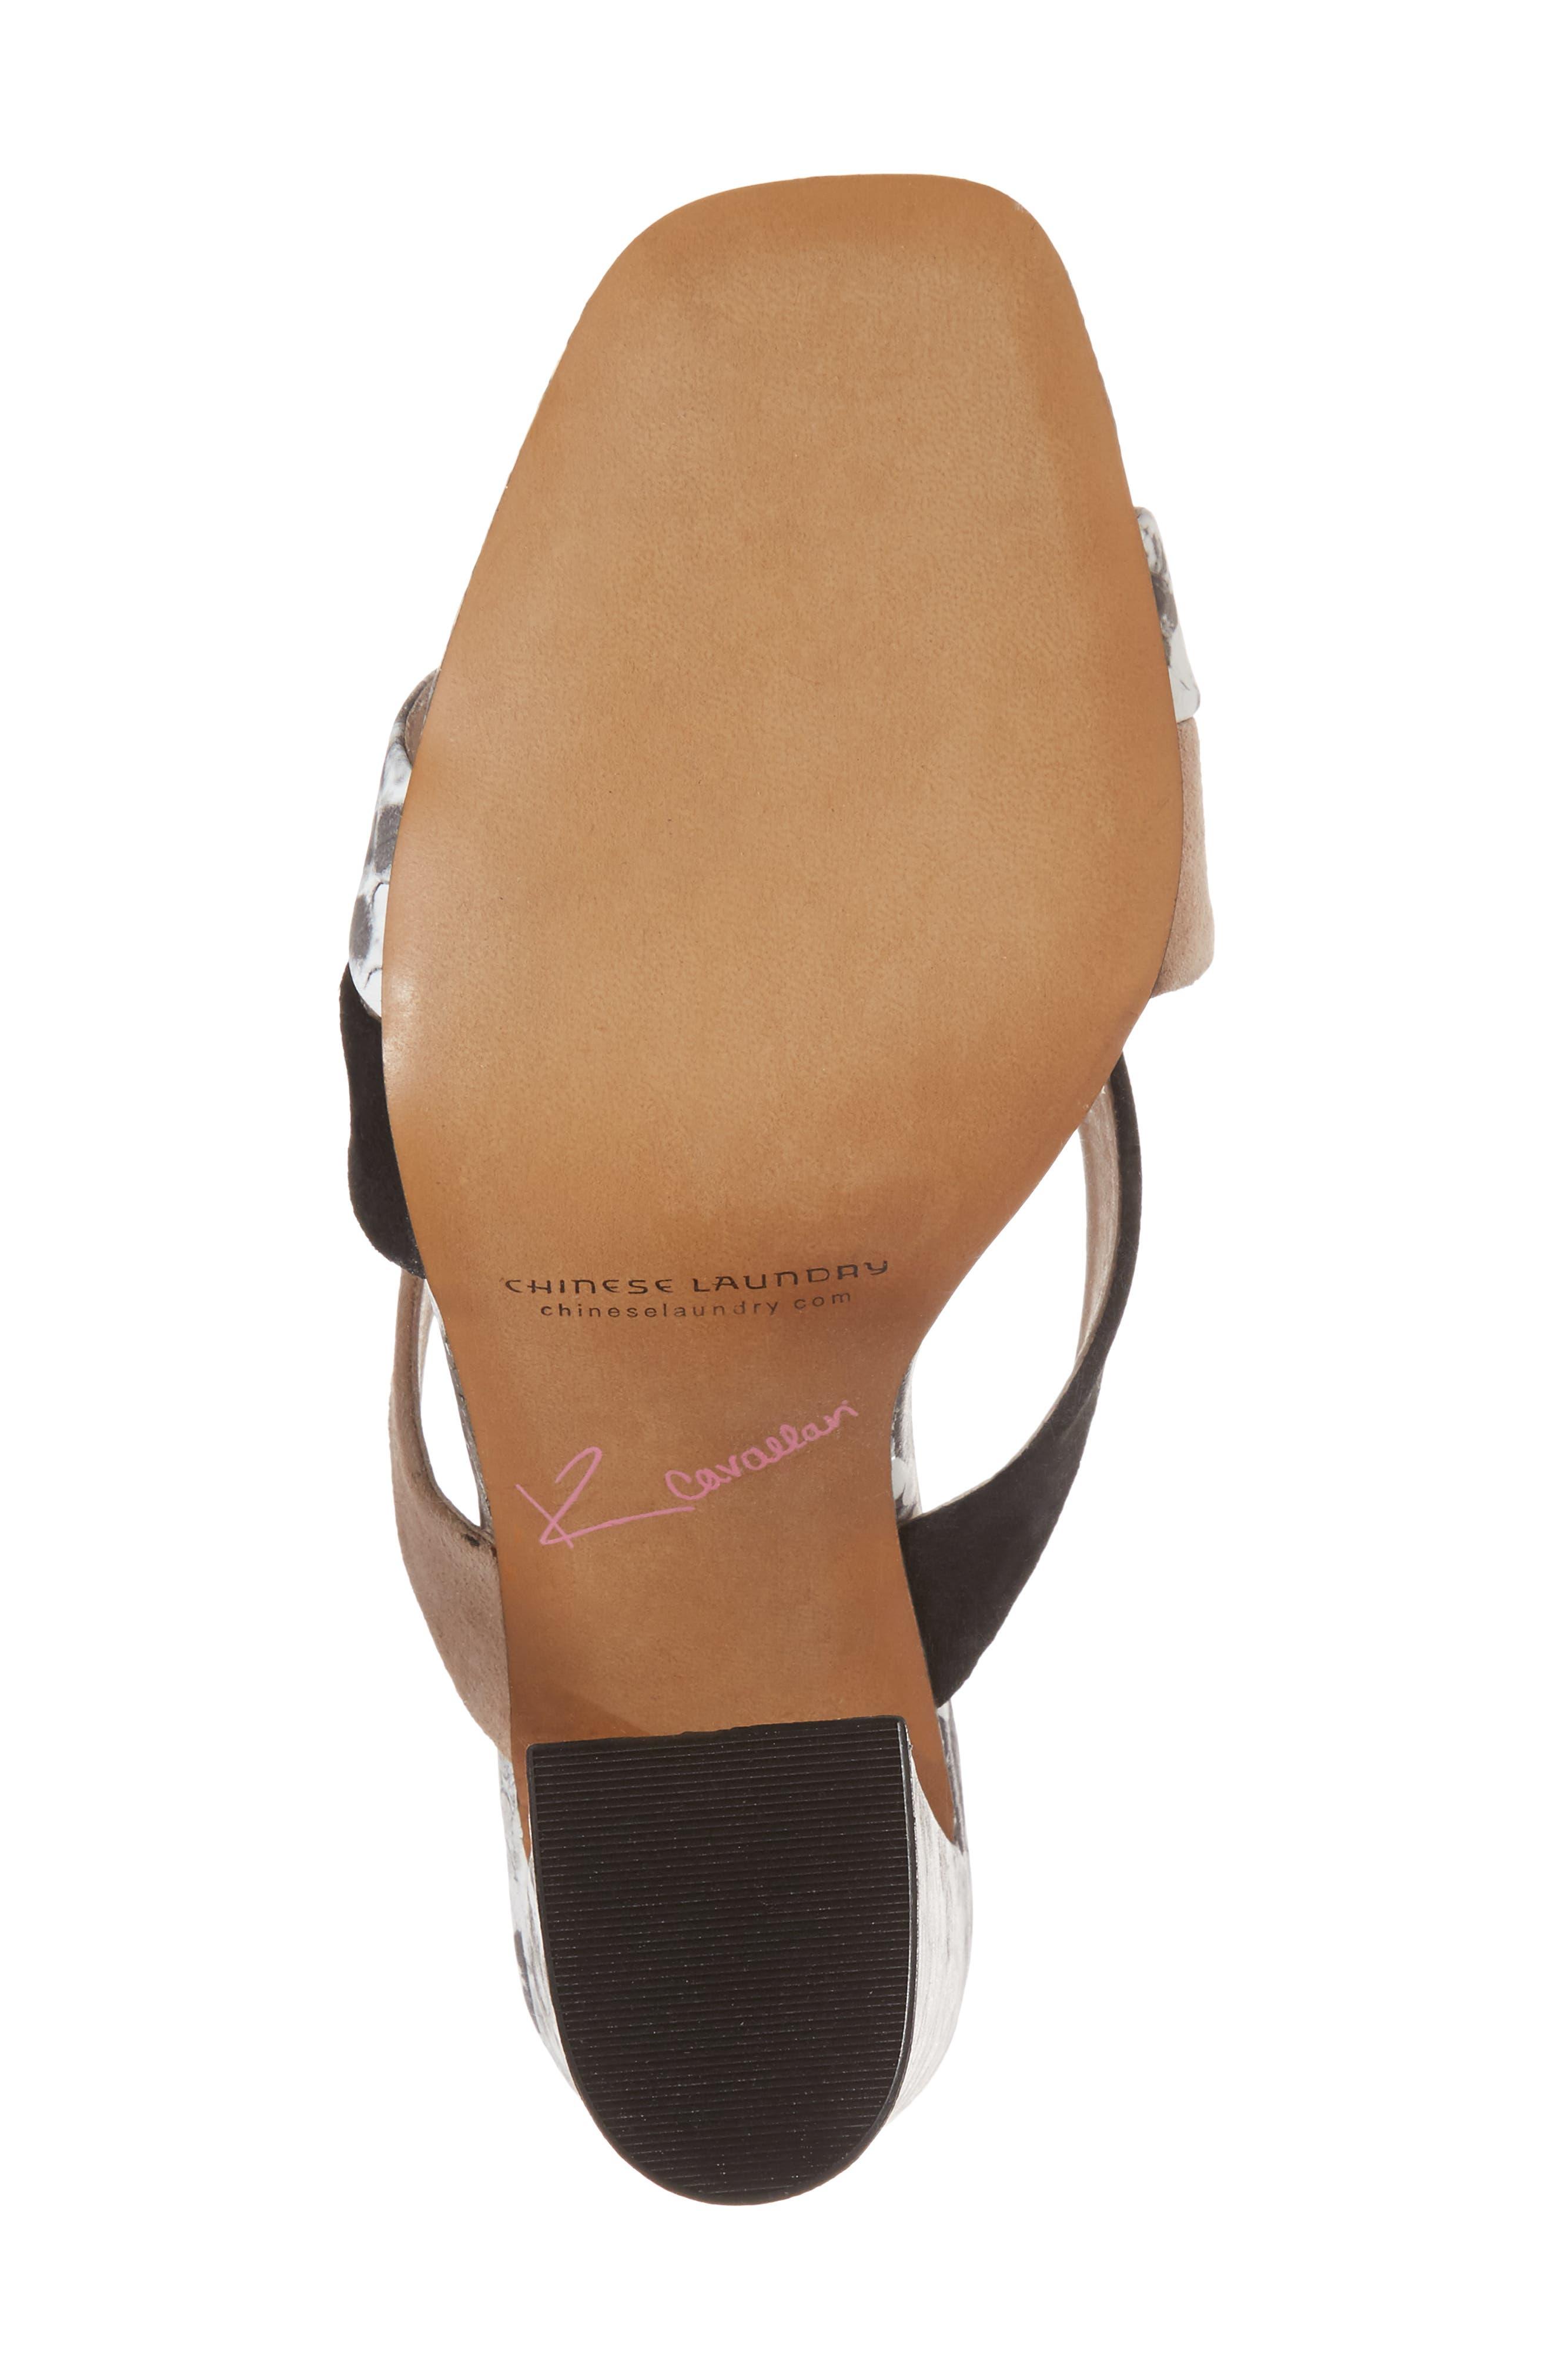 Lola Slide Sandal,                             Alternate thumbnail 6, color,                             Grey/ White Print Leather